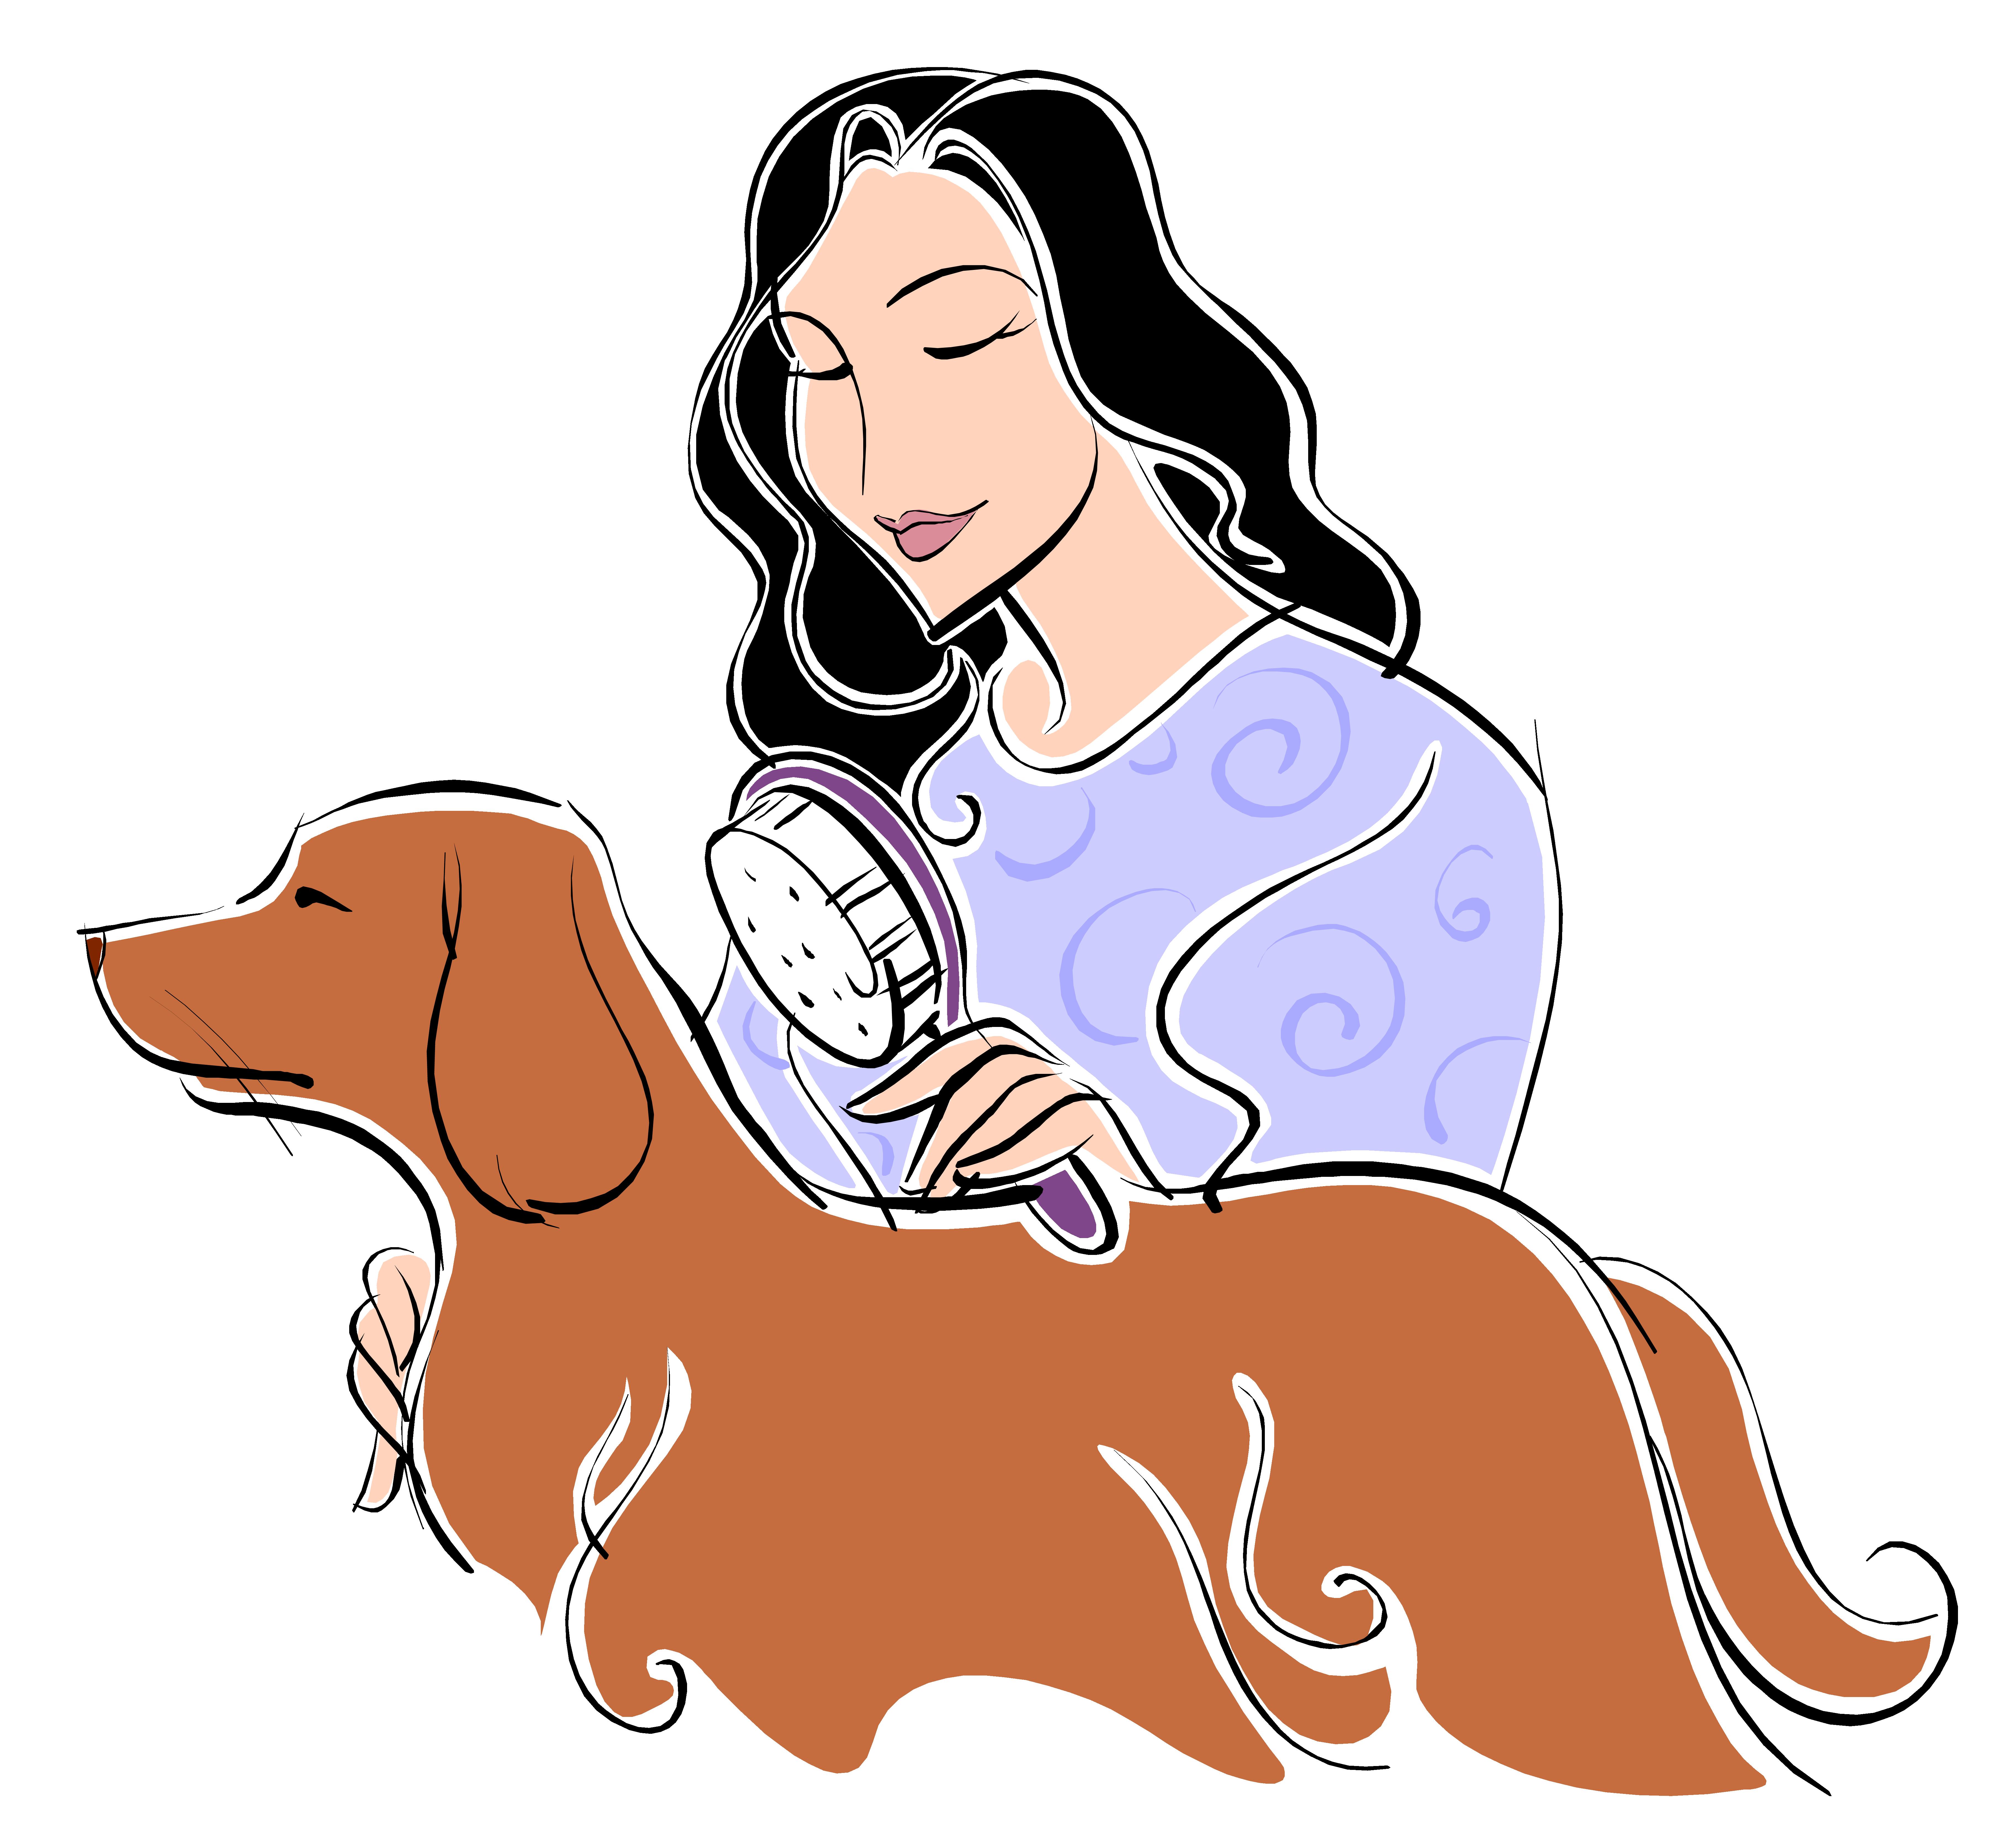 Dog bath clipart free clip black and white stock Puppy Dog Pet Clip art - Pet a bath 7209*6696 transprent Png Free ... clip black and white stock